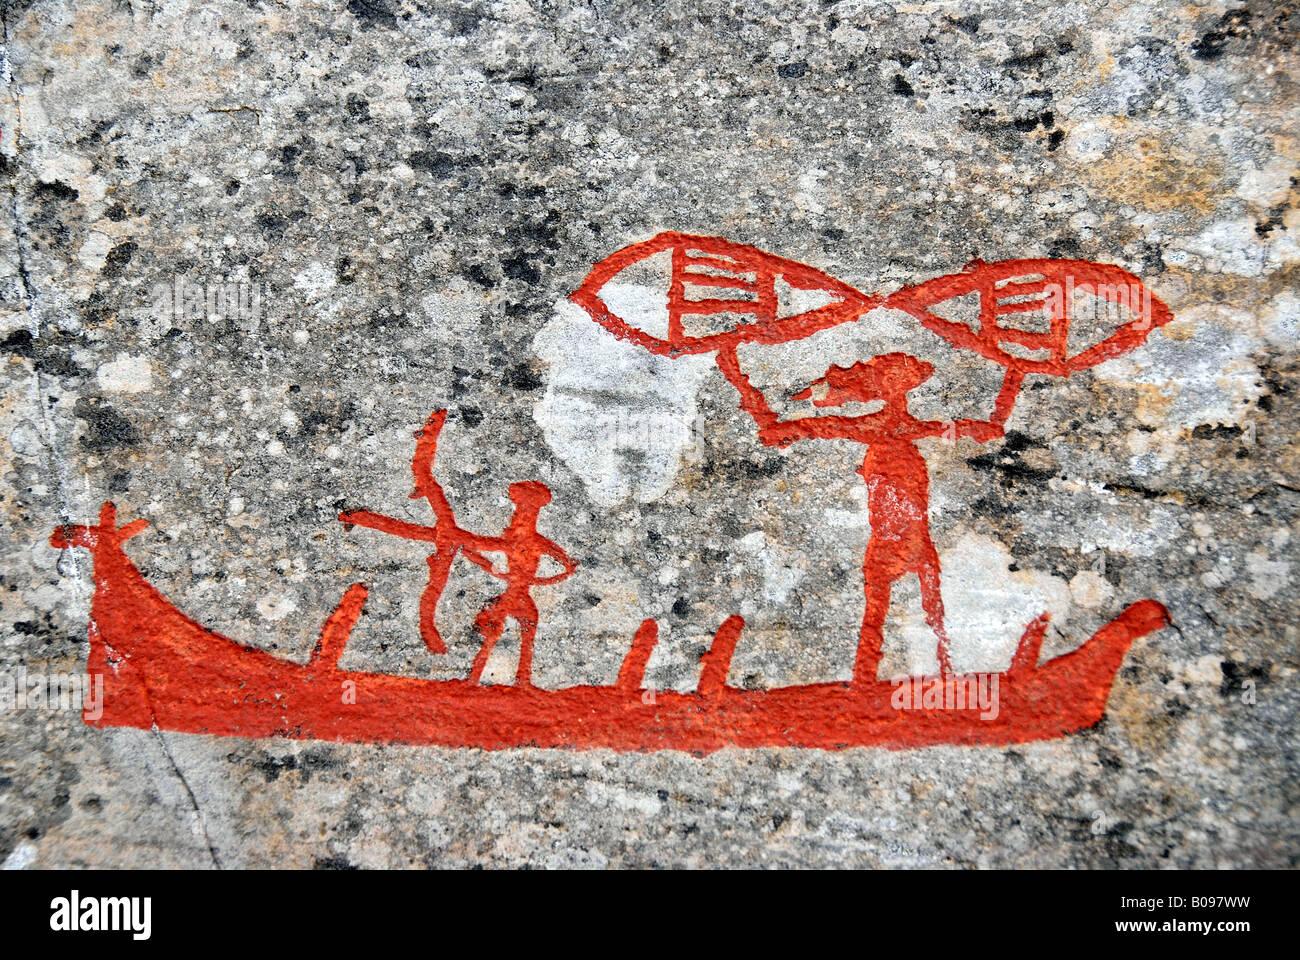 Vikings in a ship, rock painting, rock art at Alta, Norway, Scandinavia - Stock Image